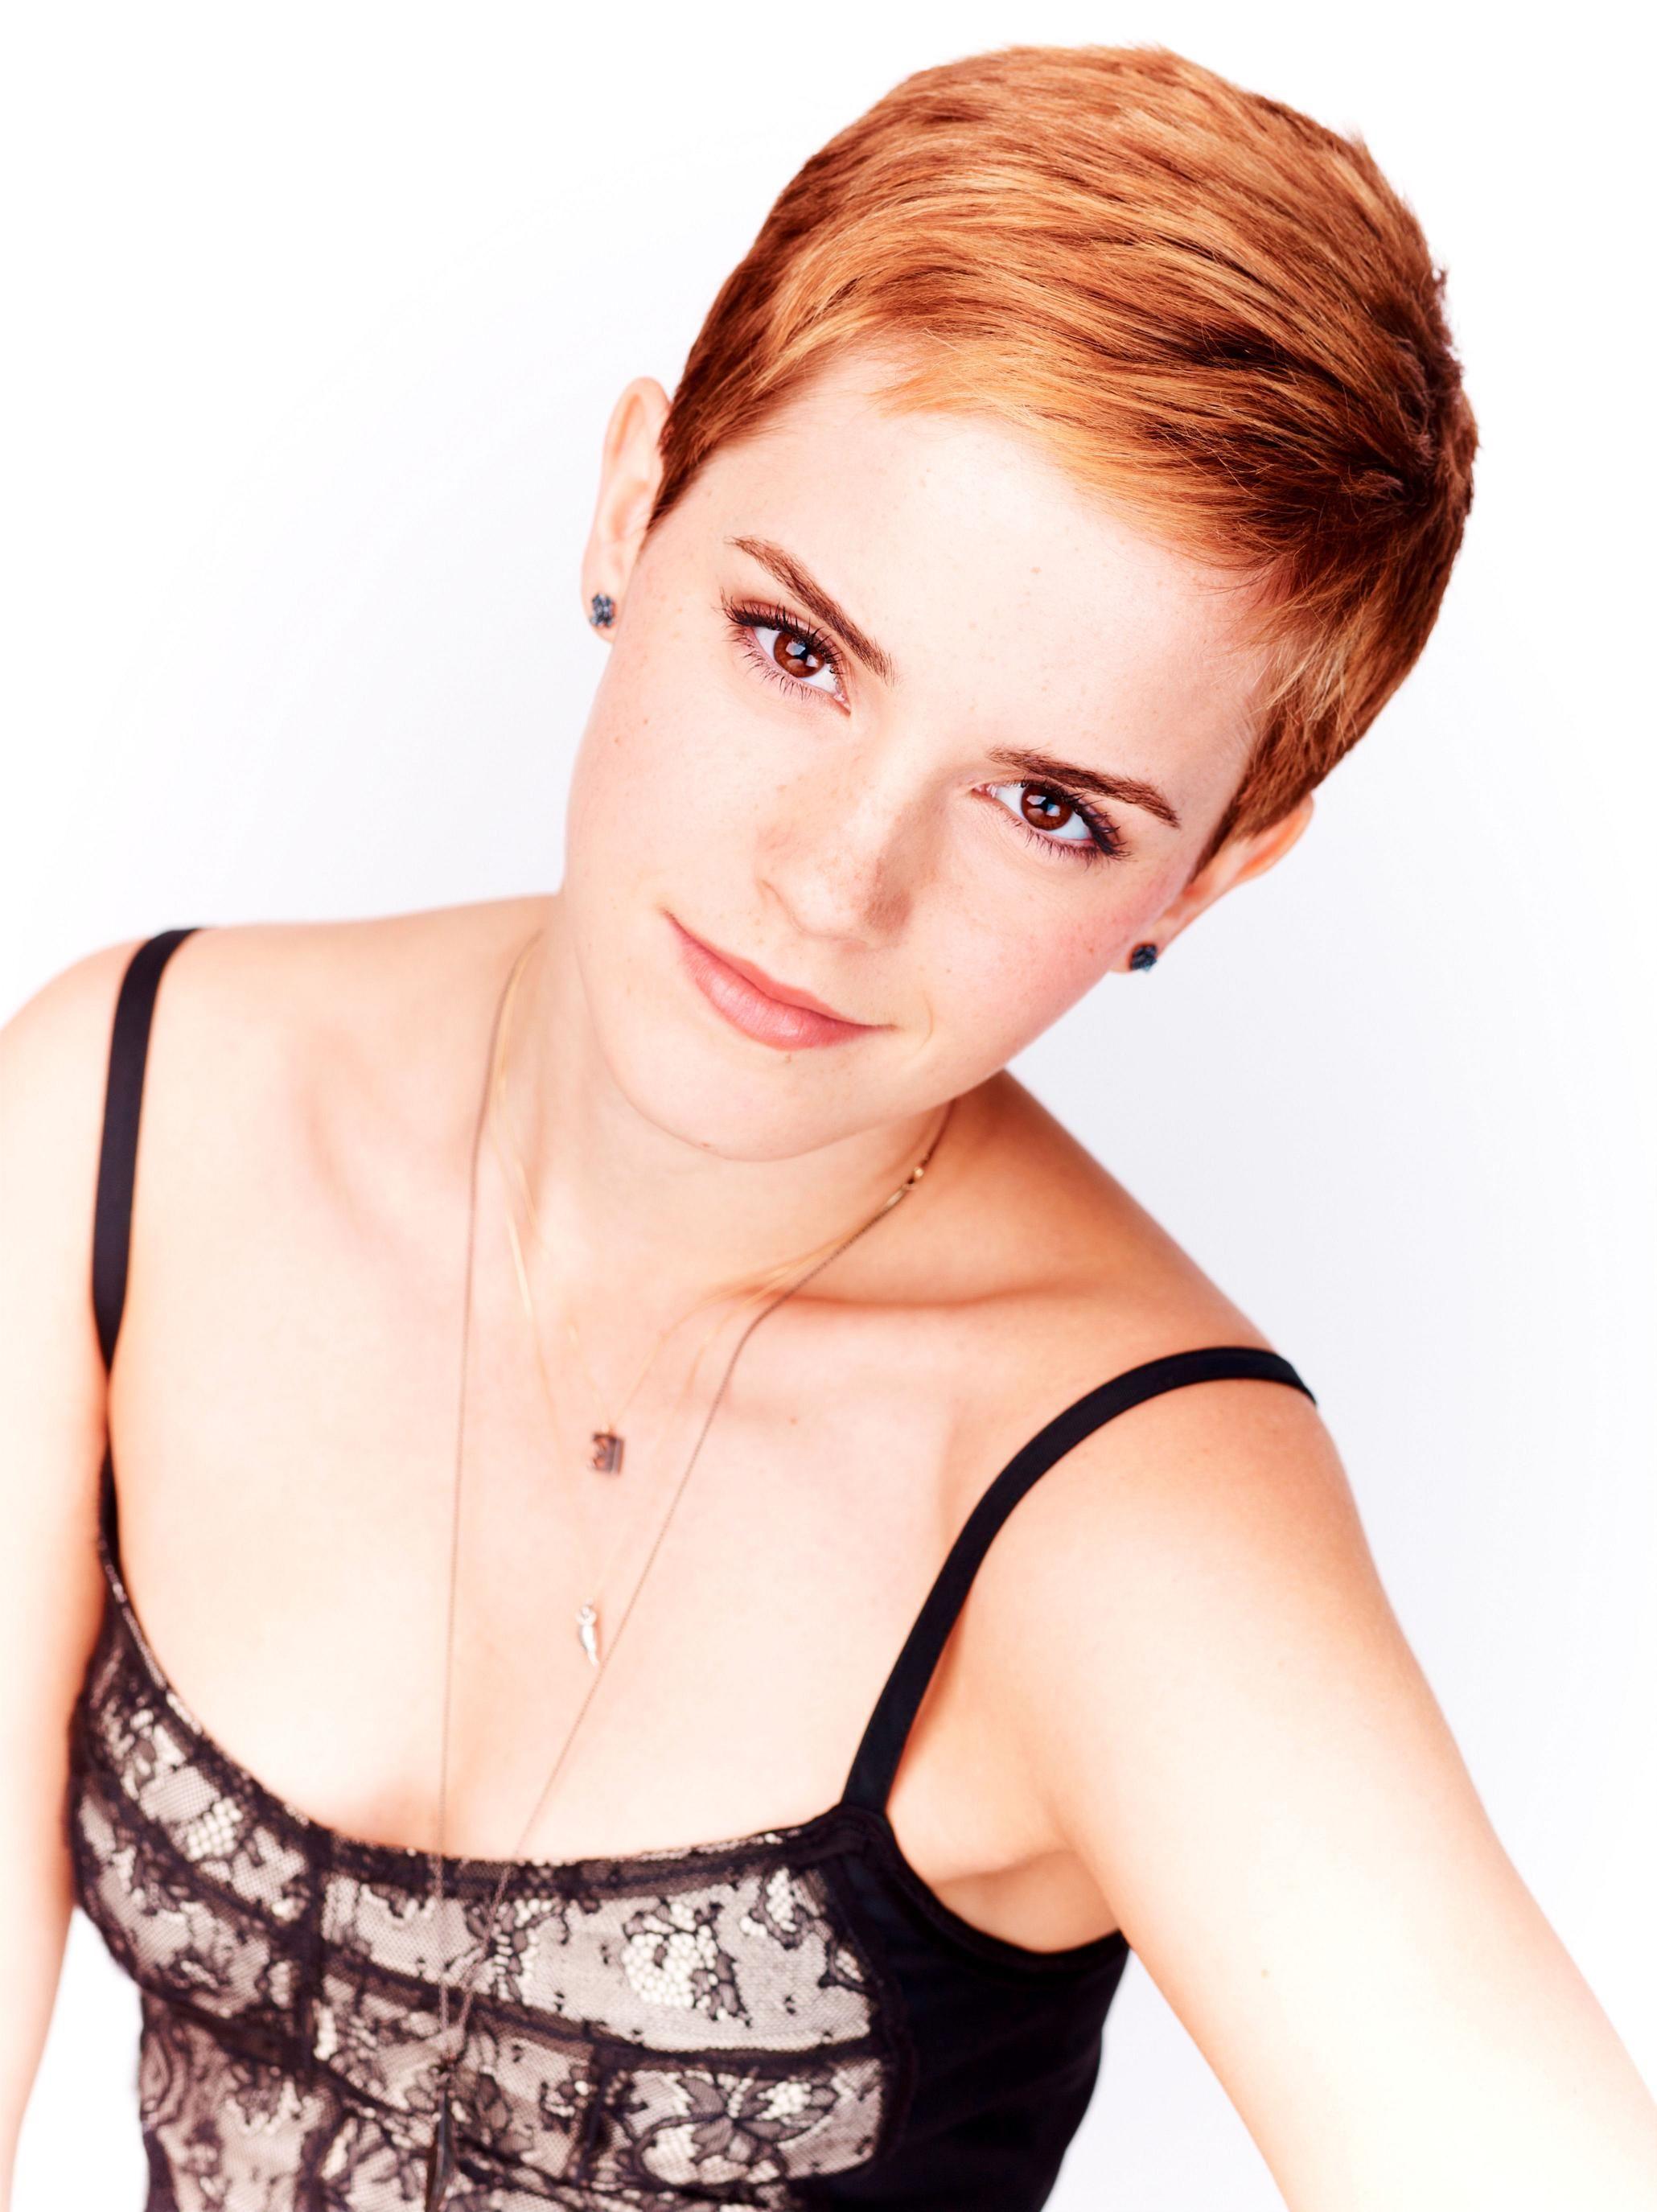 Emma Watson photo gallery Emma watson short hair